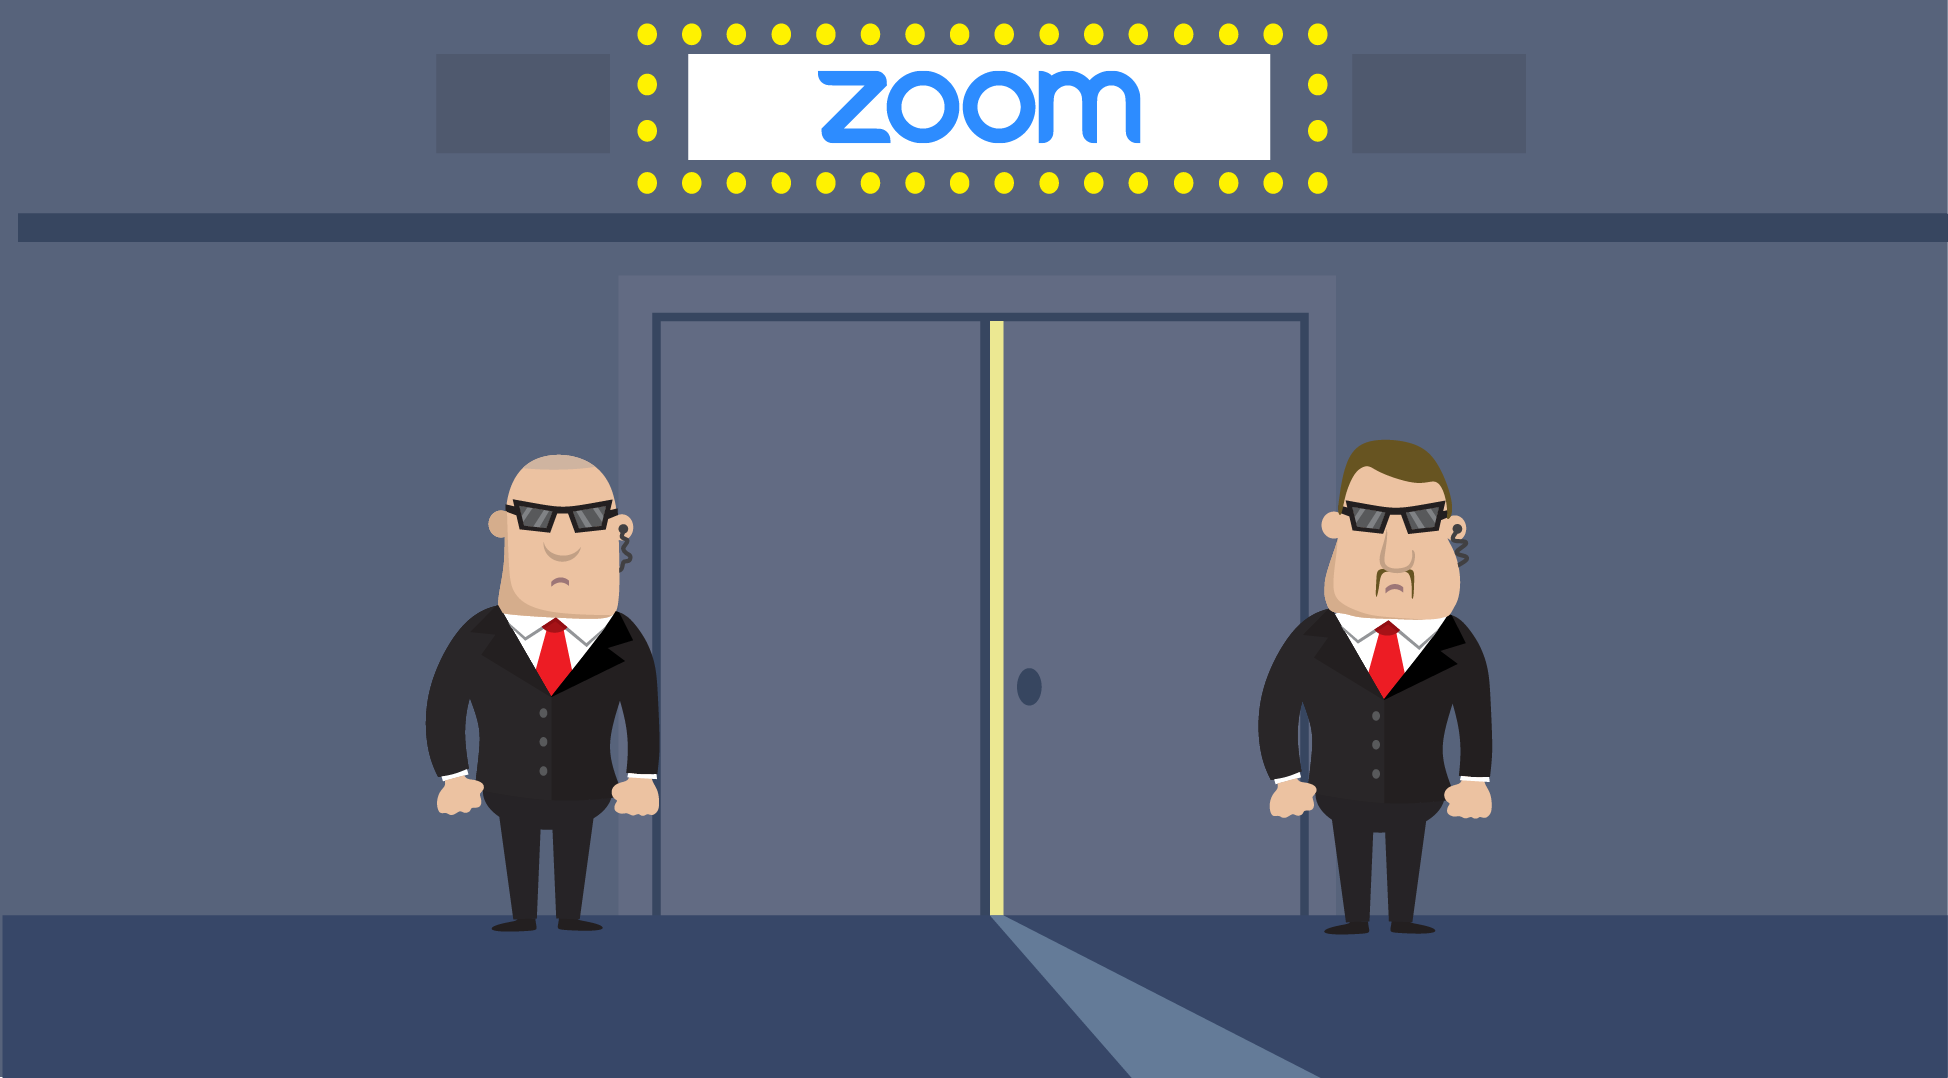 blog.zoom.us